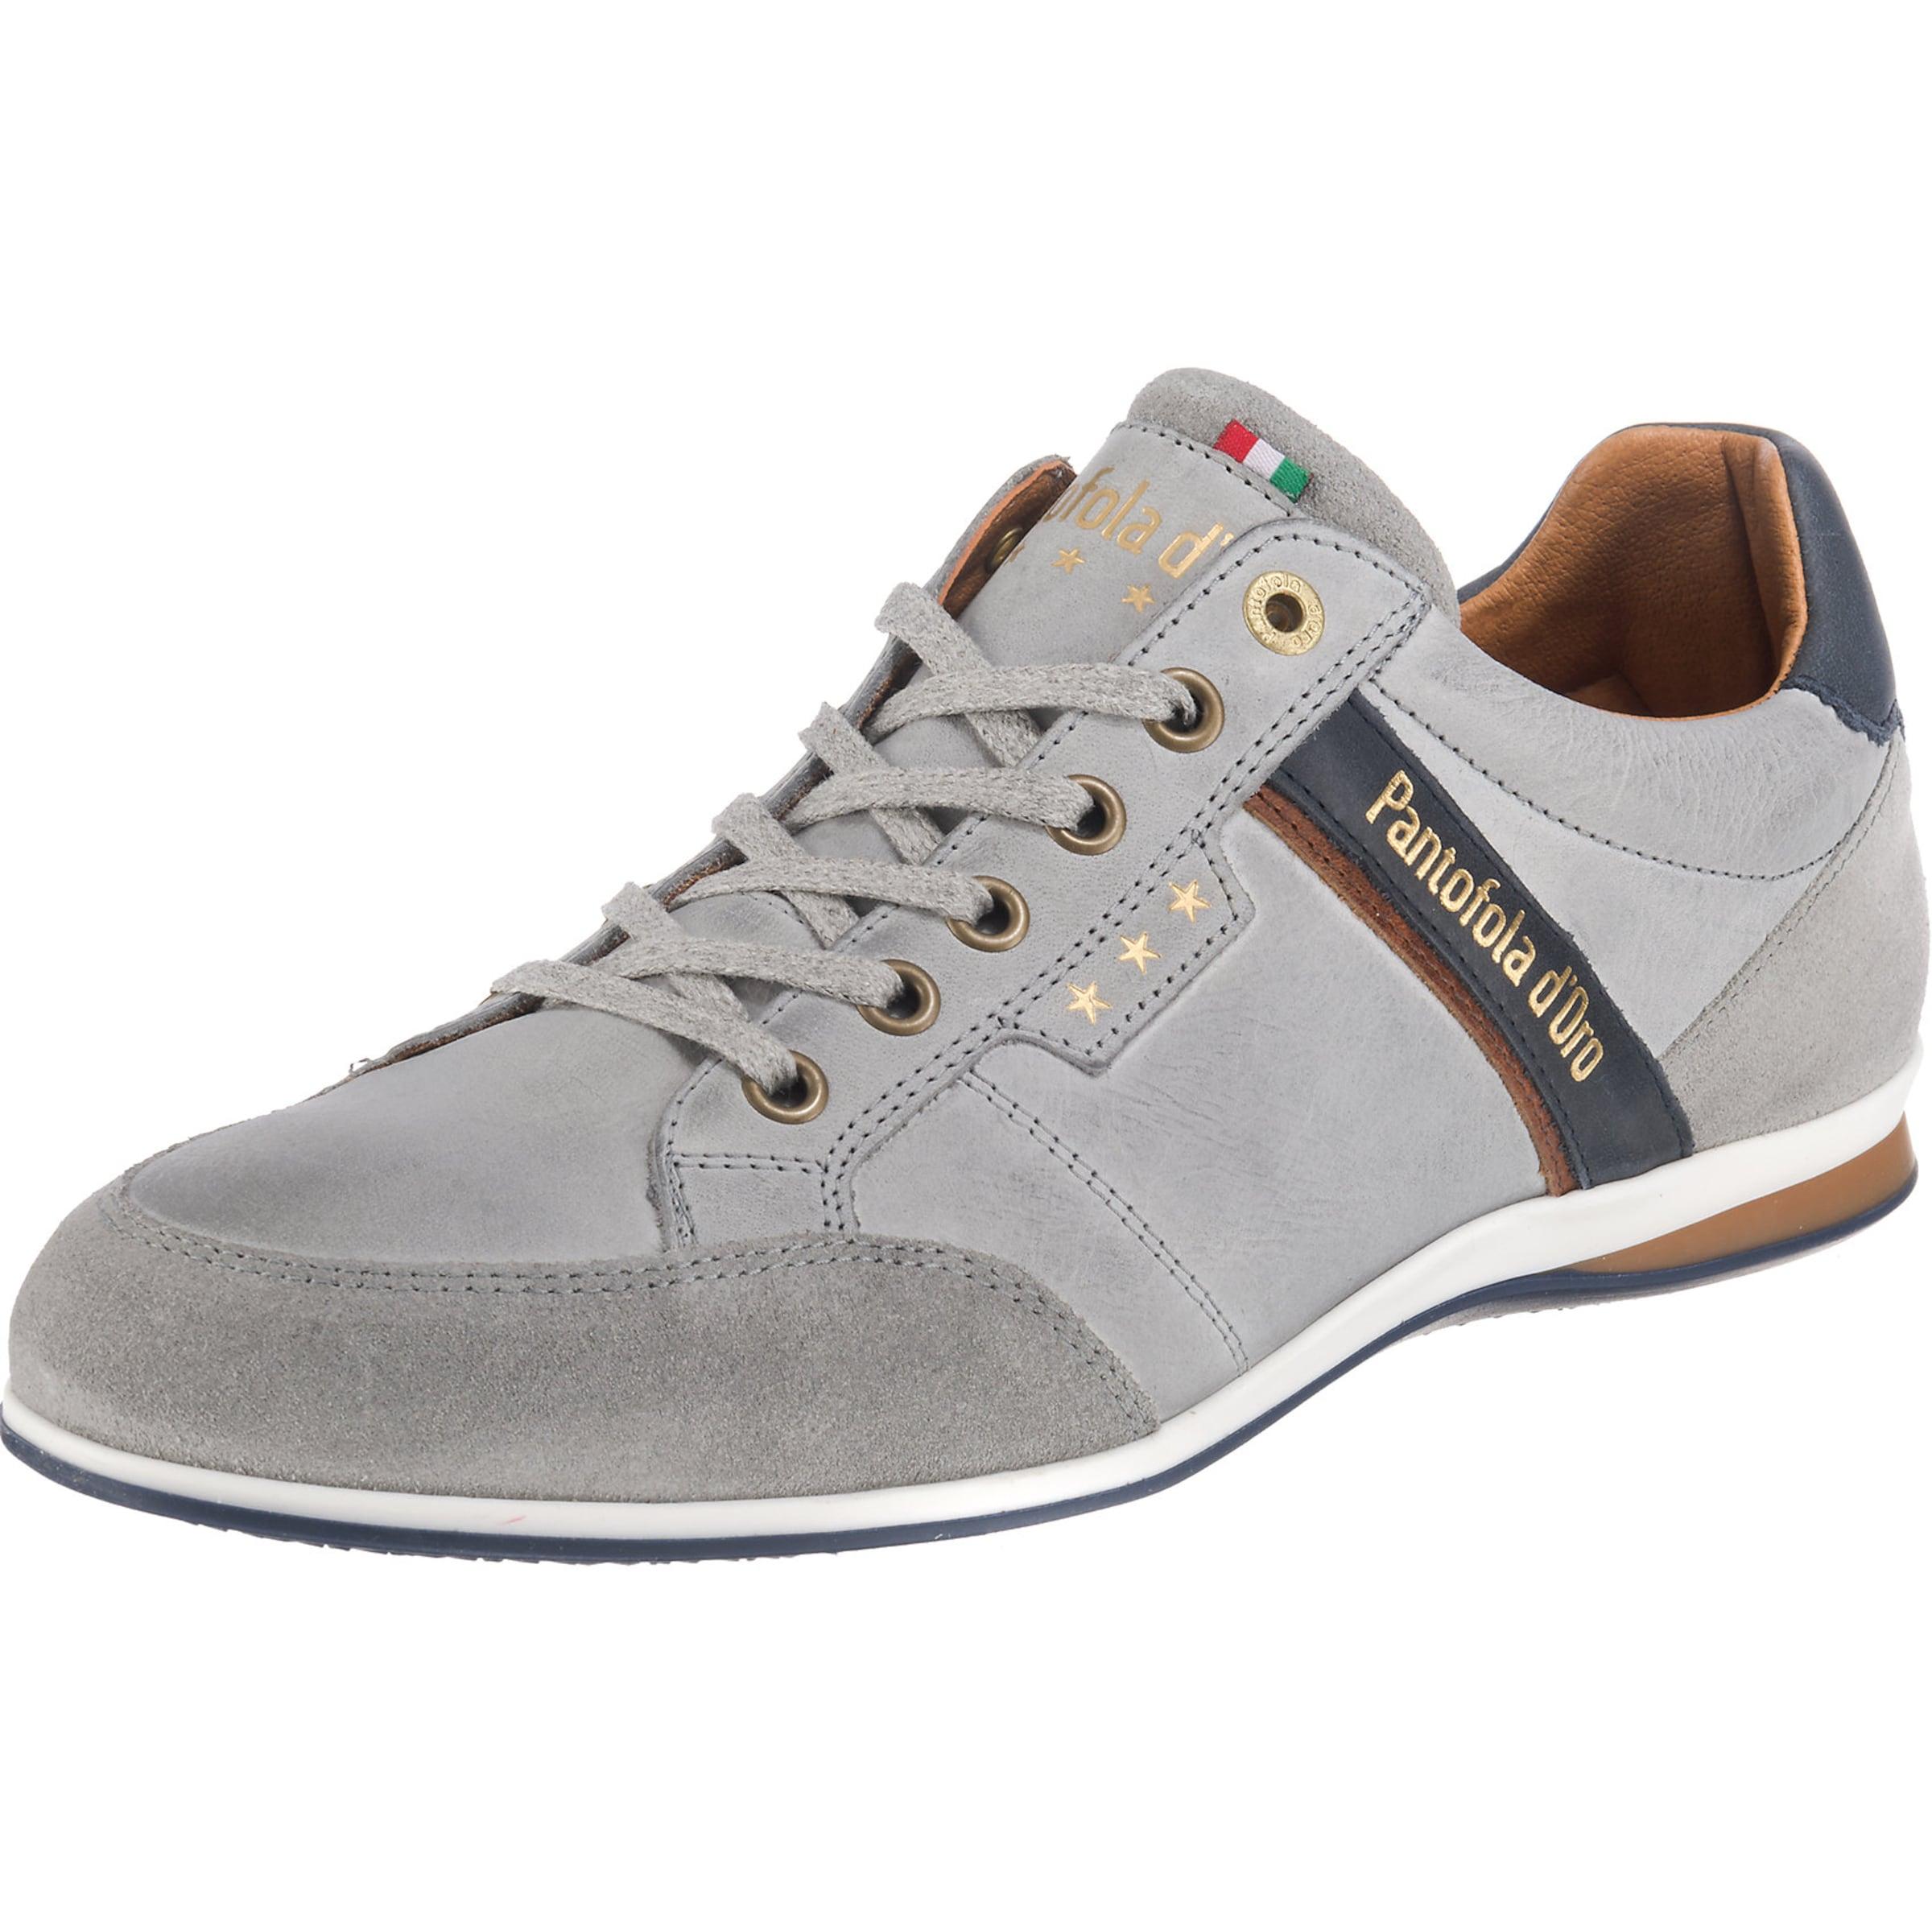 PANTOFOLA D ORO ROMA UOMO LOW Sneakers Low